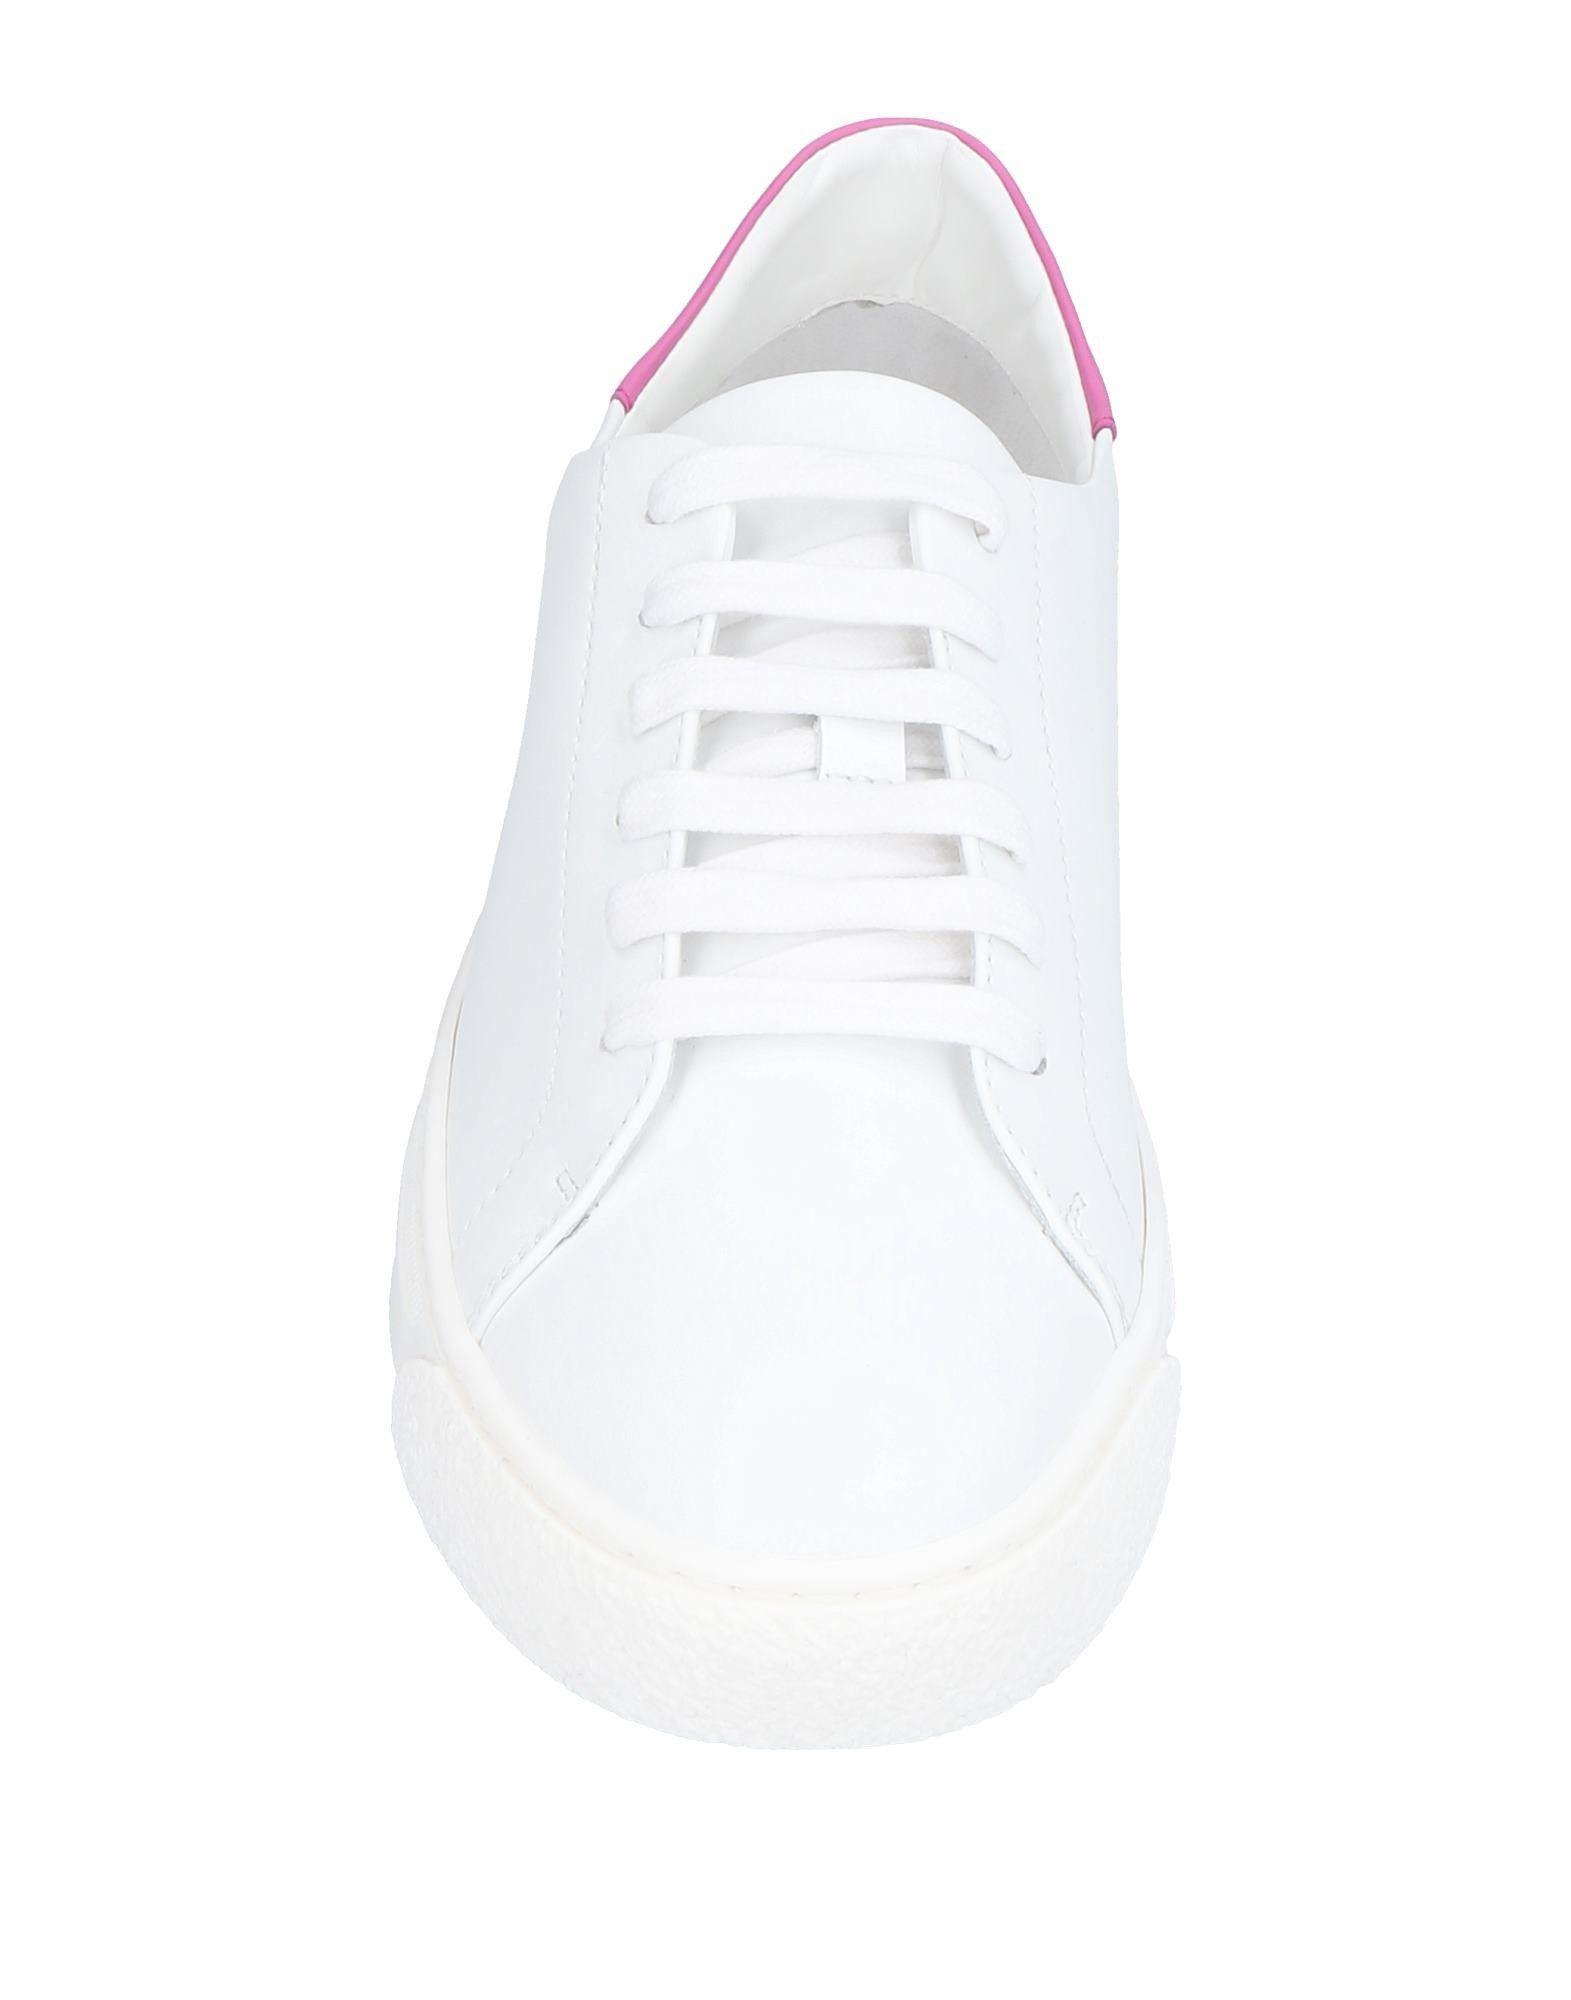 Anya Hindmarch Sneakers Damen  11464724TKGut aussehende strapazierfähige Schuhe